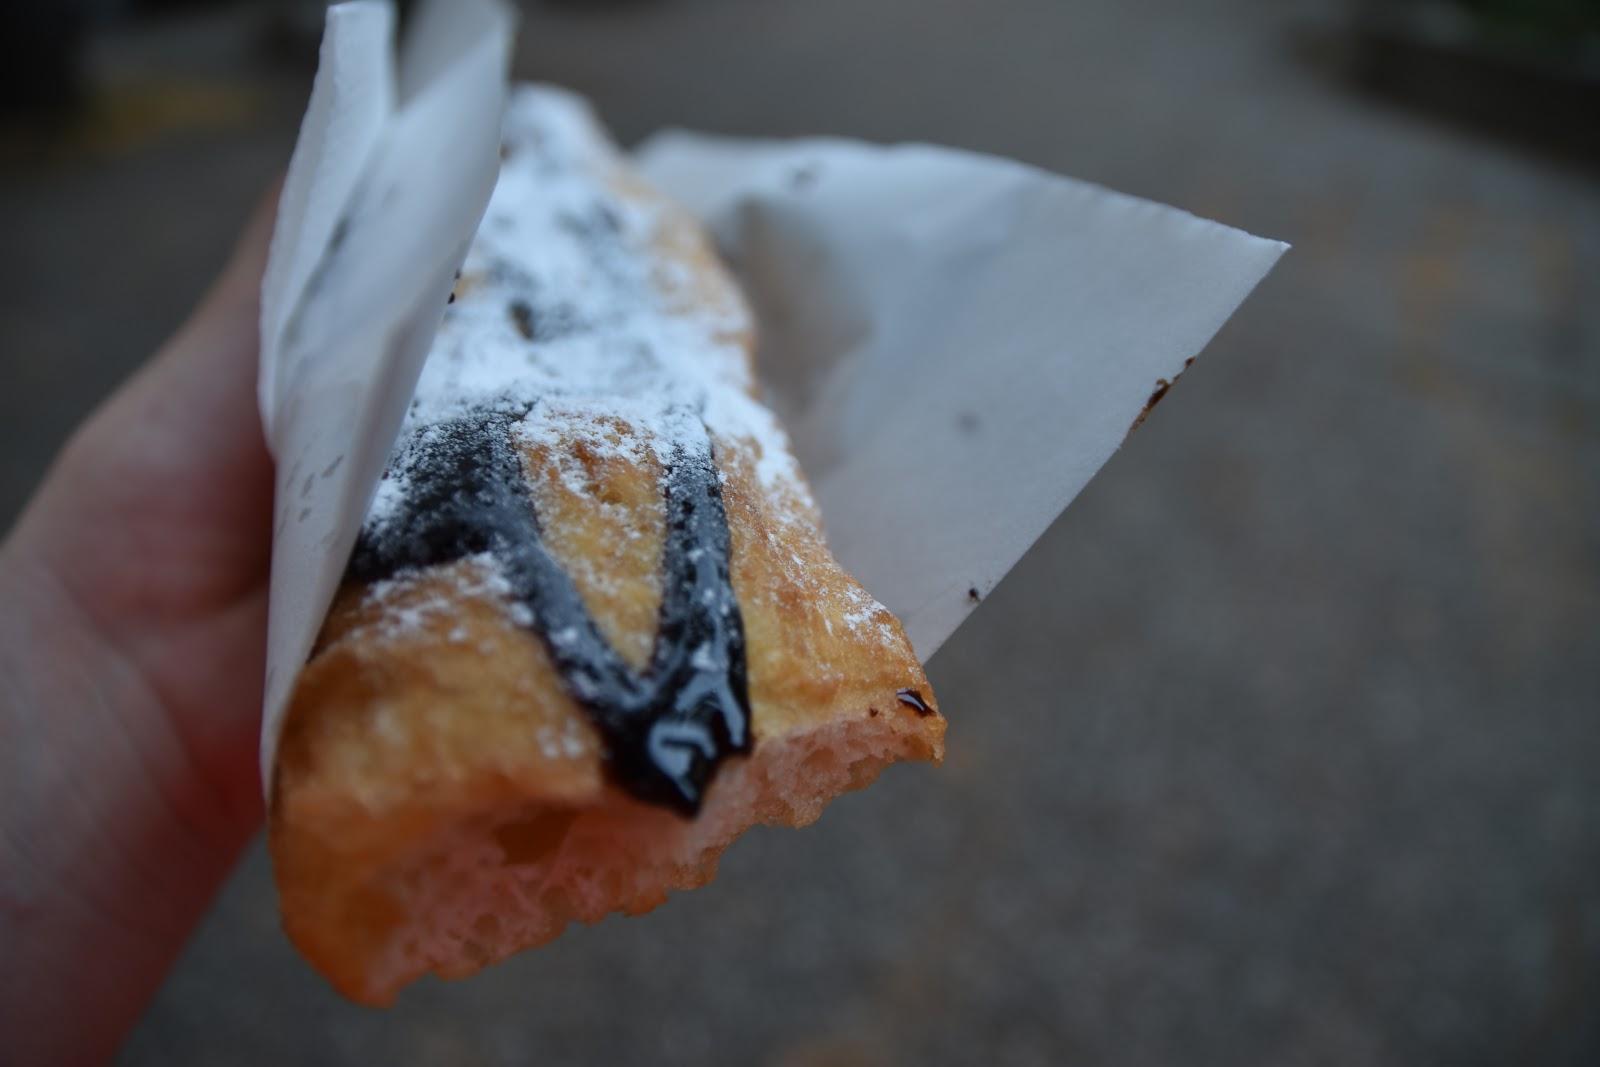 srbská specialita Mekike